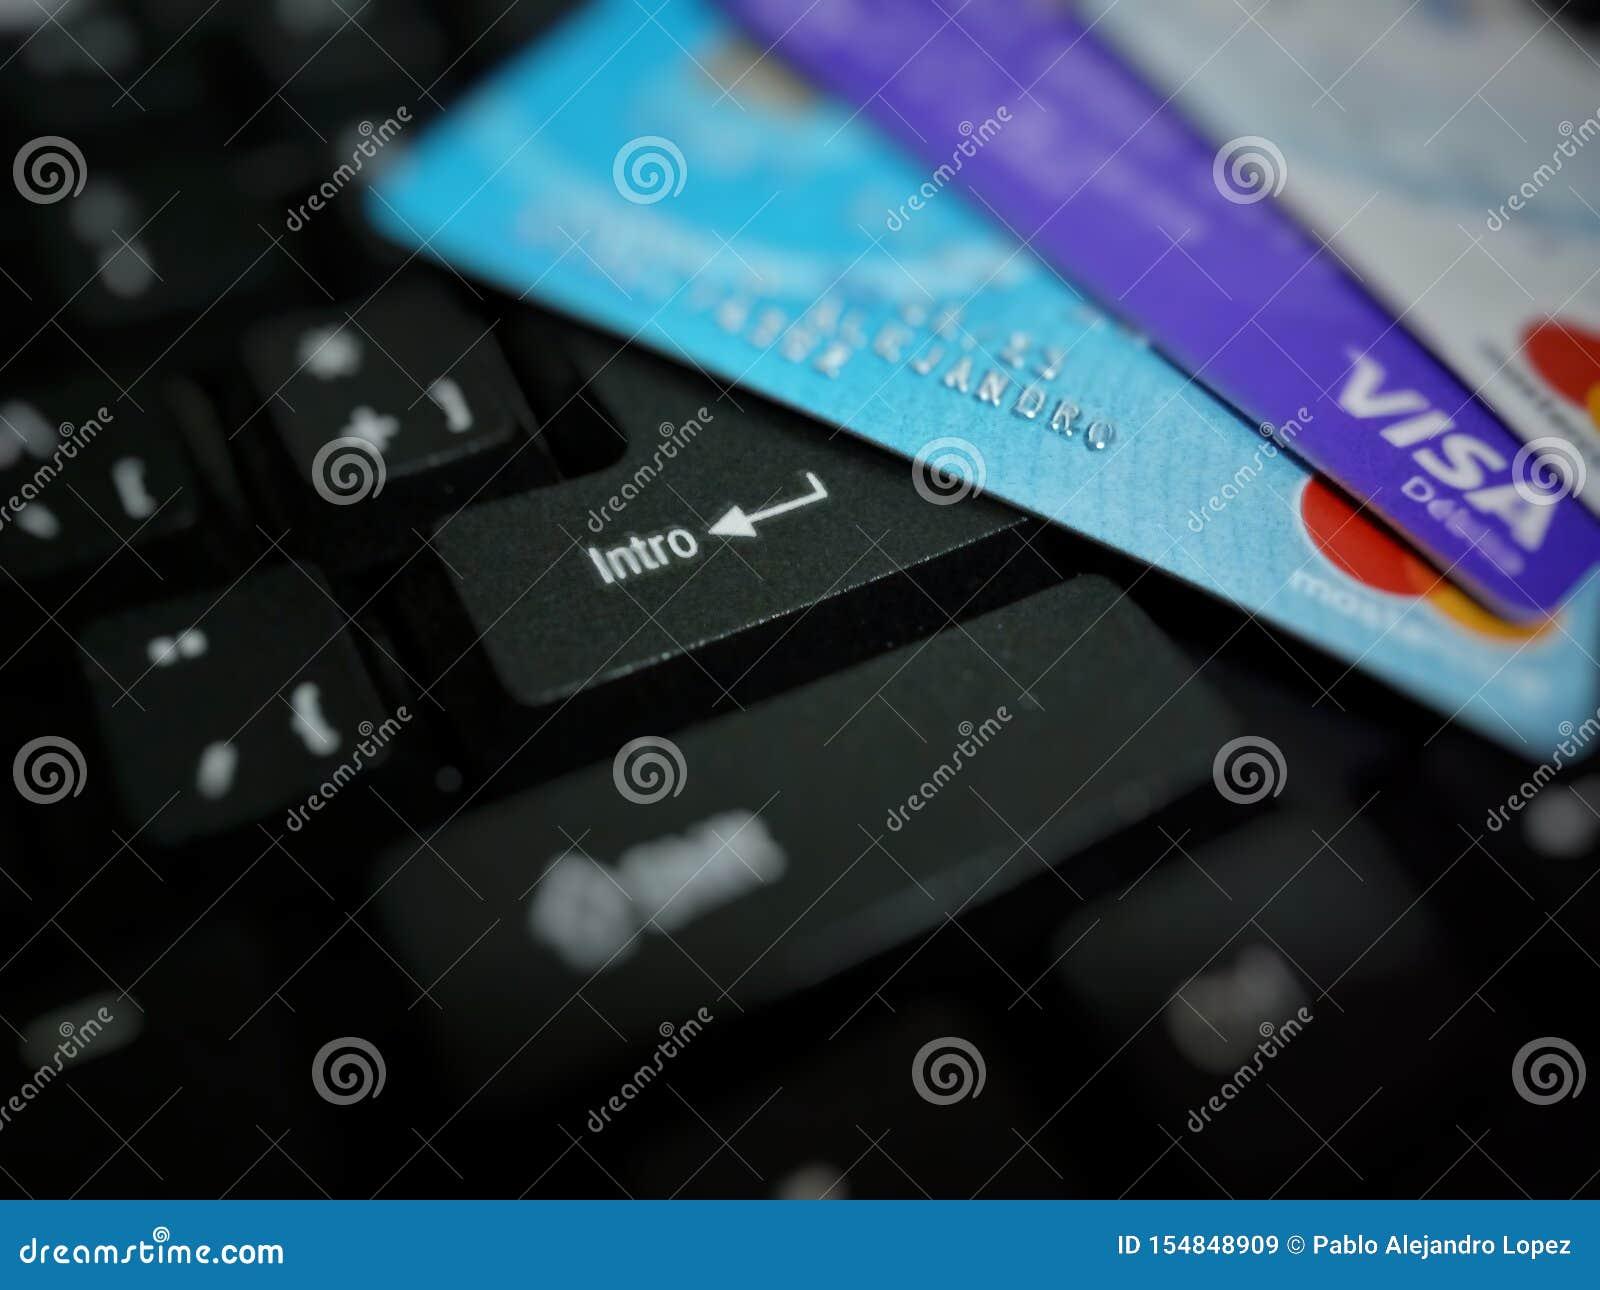 Card, credit, debit, commerce, electronic, market, online, line